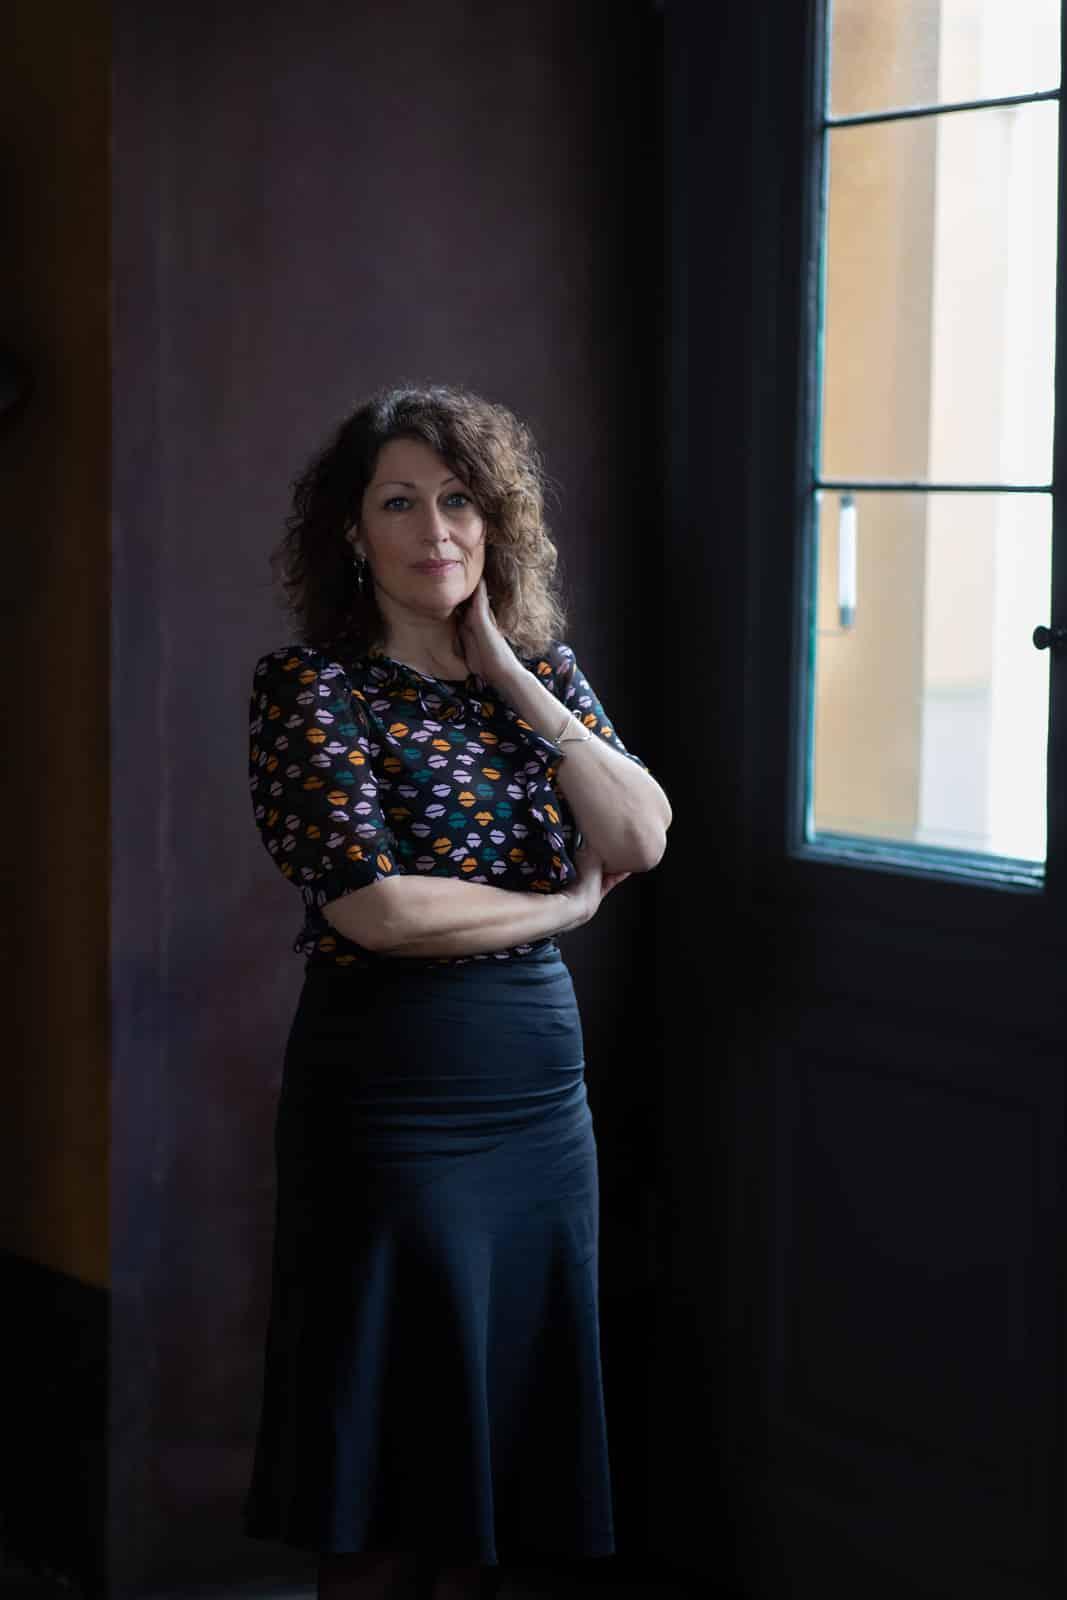 Elisabeth Åsbrink / Cph / 2021